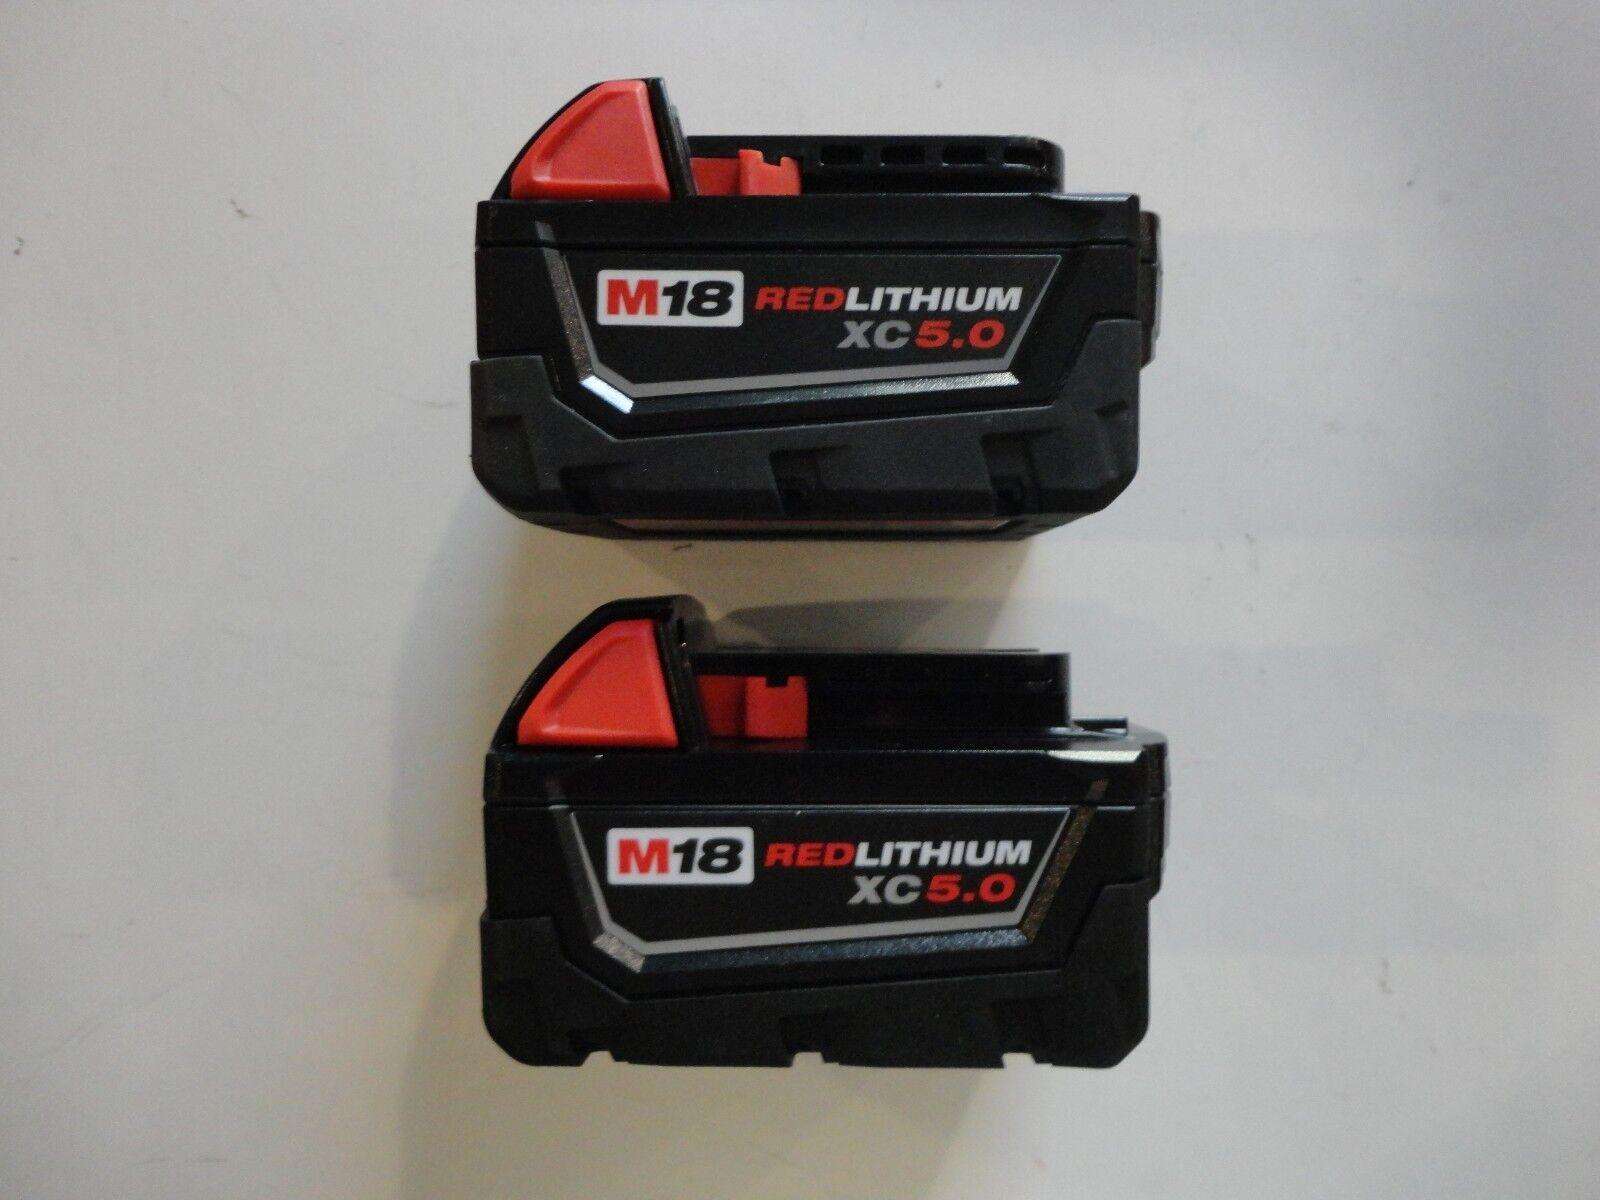 (2) MILWAUKEE 18V 18 Volt L i- Ion 48-11-1850 XC 5.0 AH Battery packs 48-11-1852 2